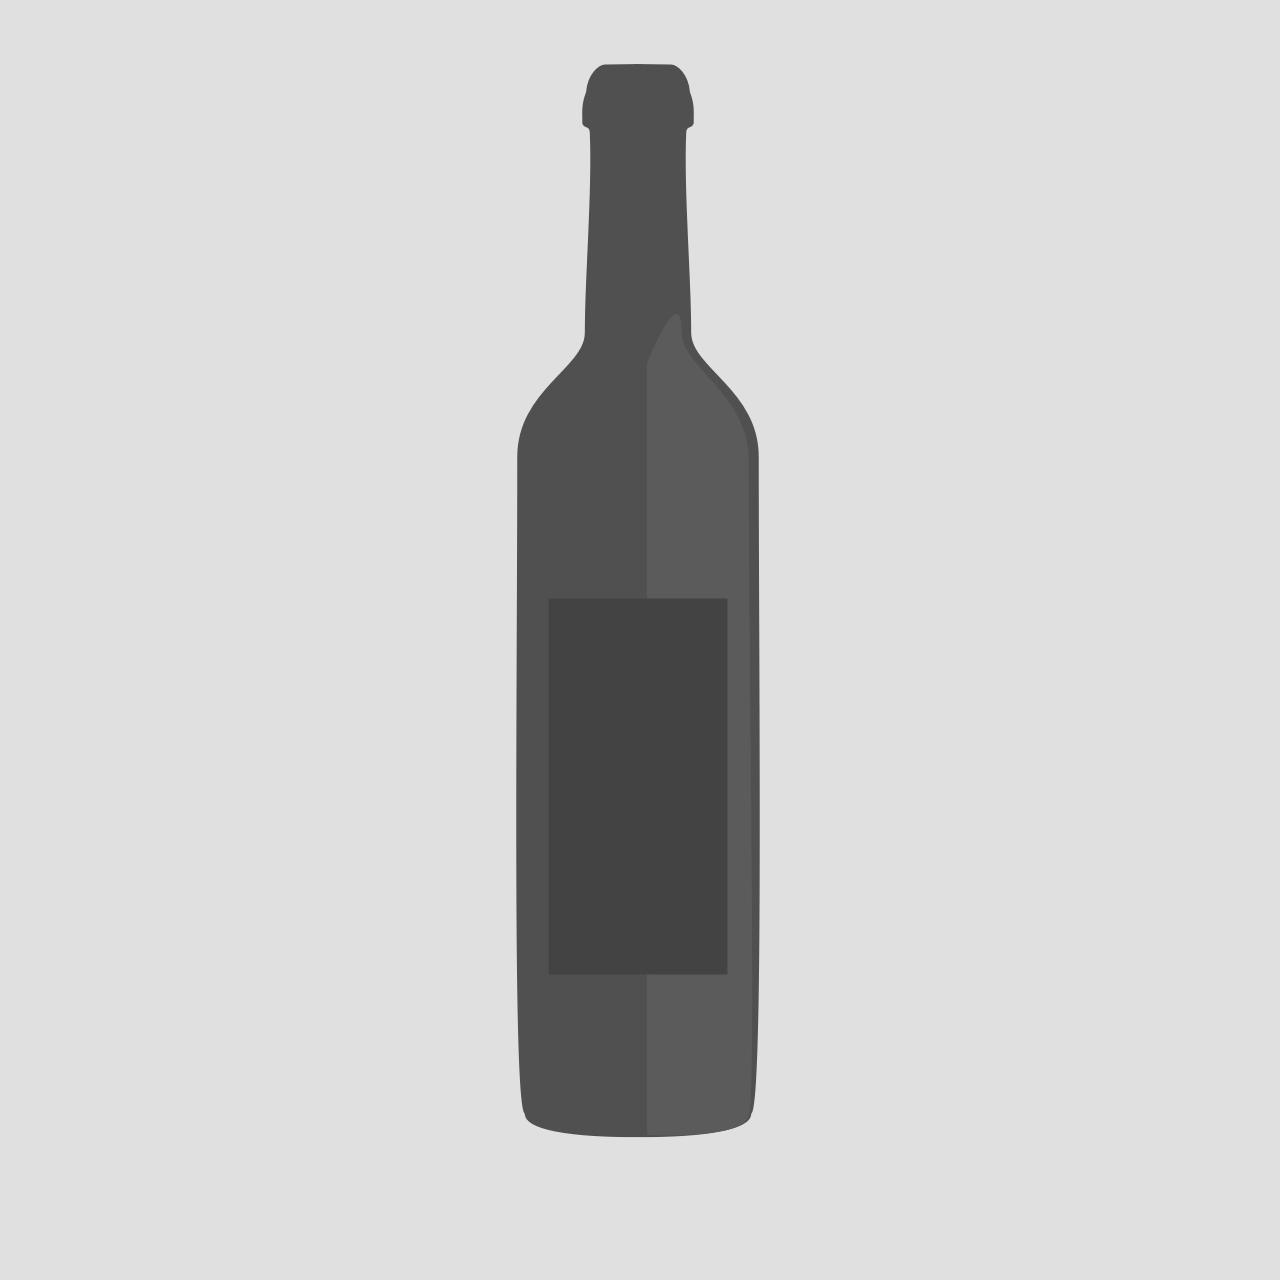 Slacker Wines Linne Calodo Wanna Be Red 2016